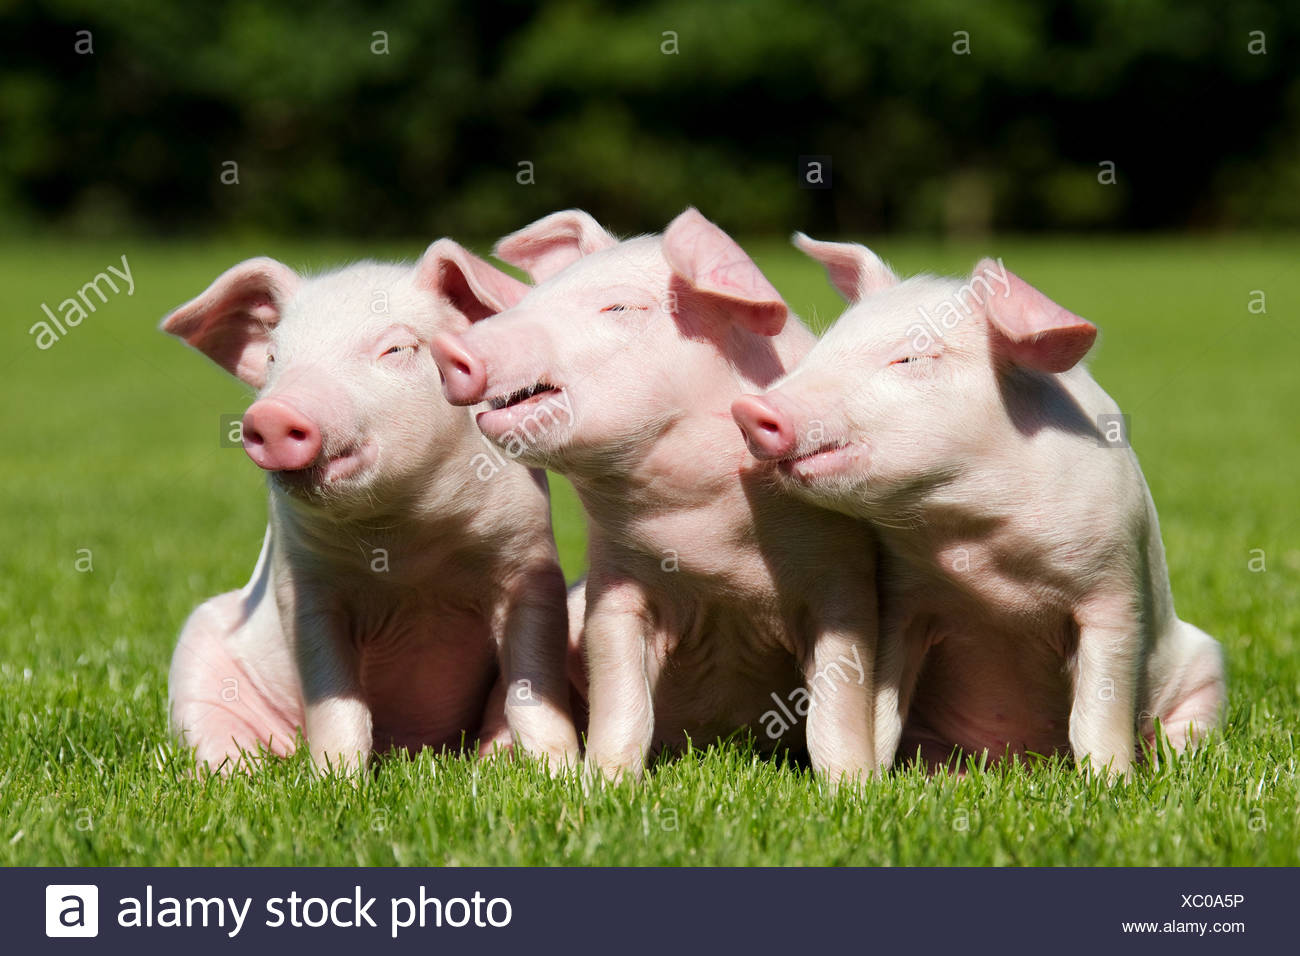 Three piglets in field - Stock Image